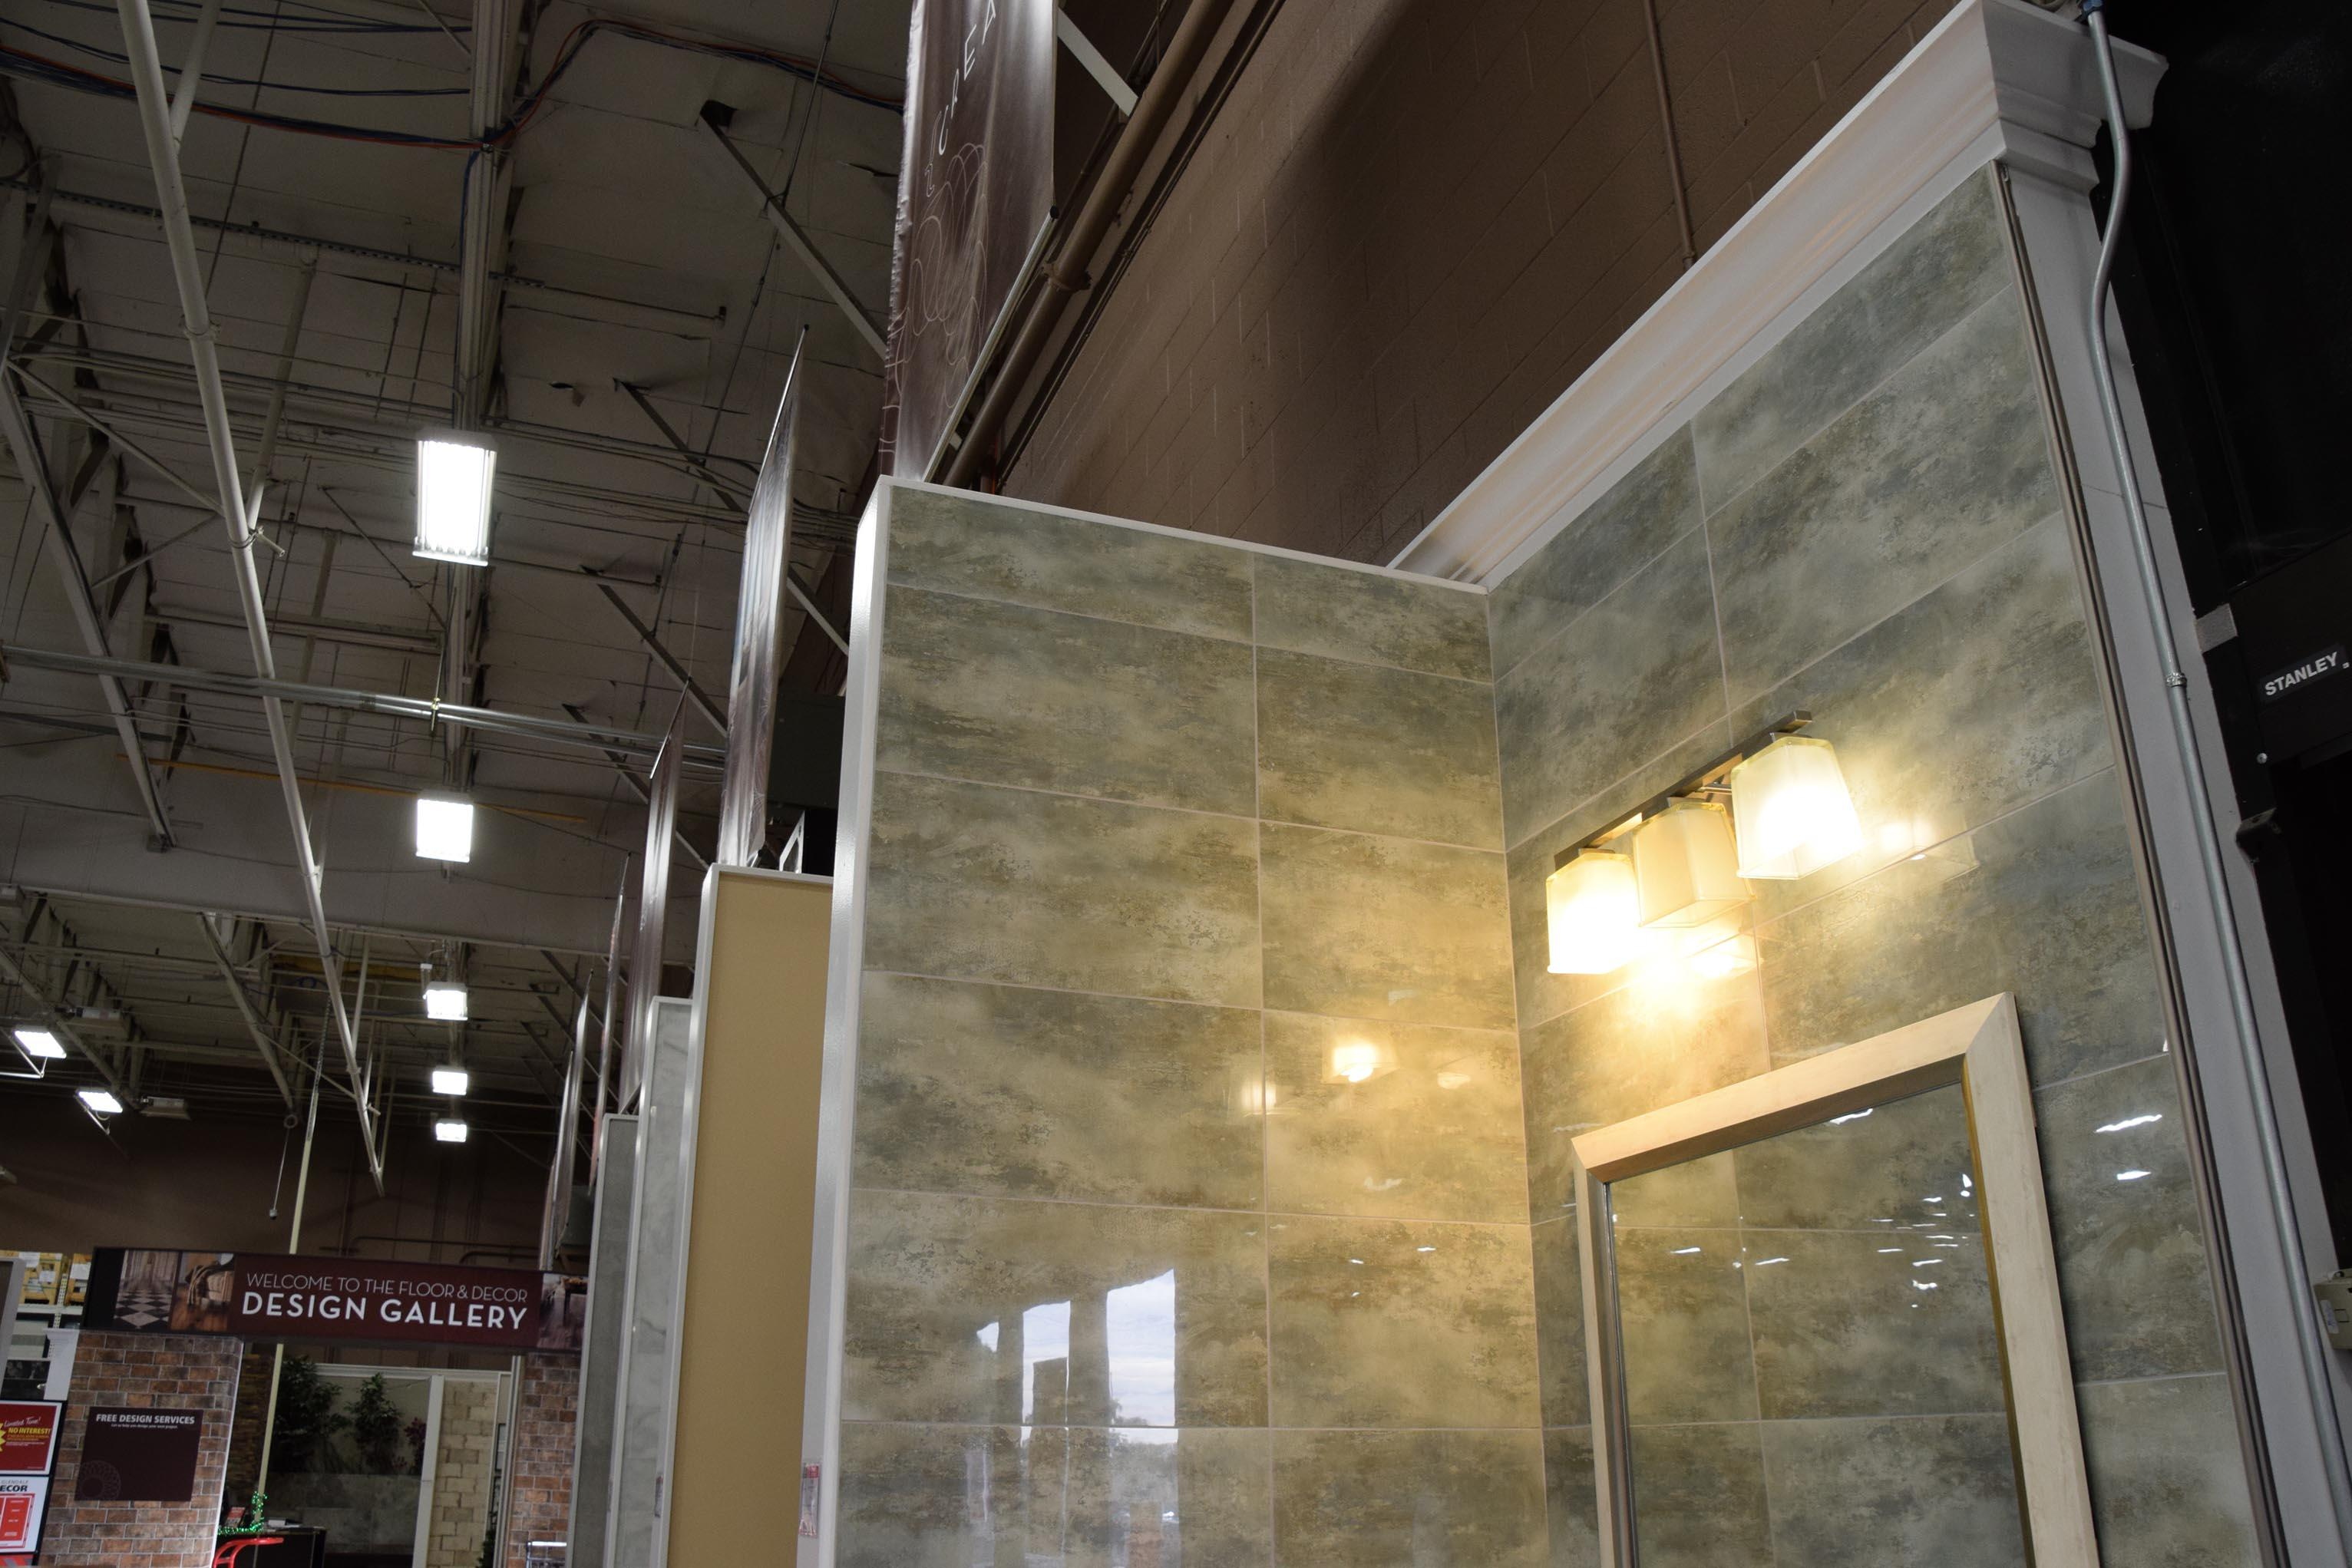 Floor Decor 5880 W Bell Rd Glendale Az Interior Decorators Design